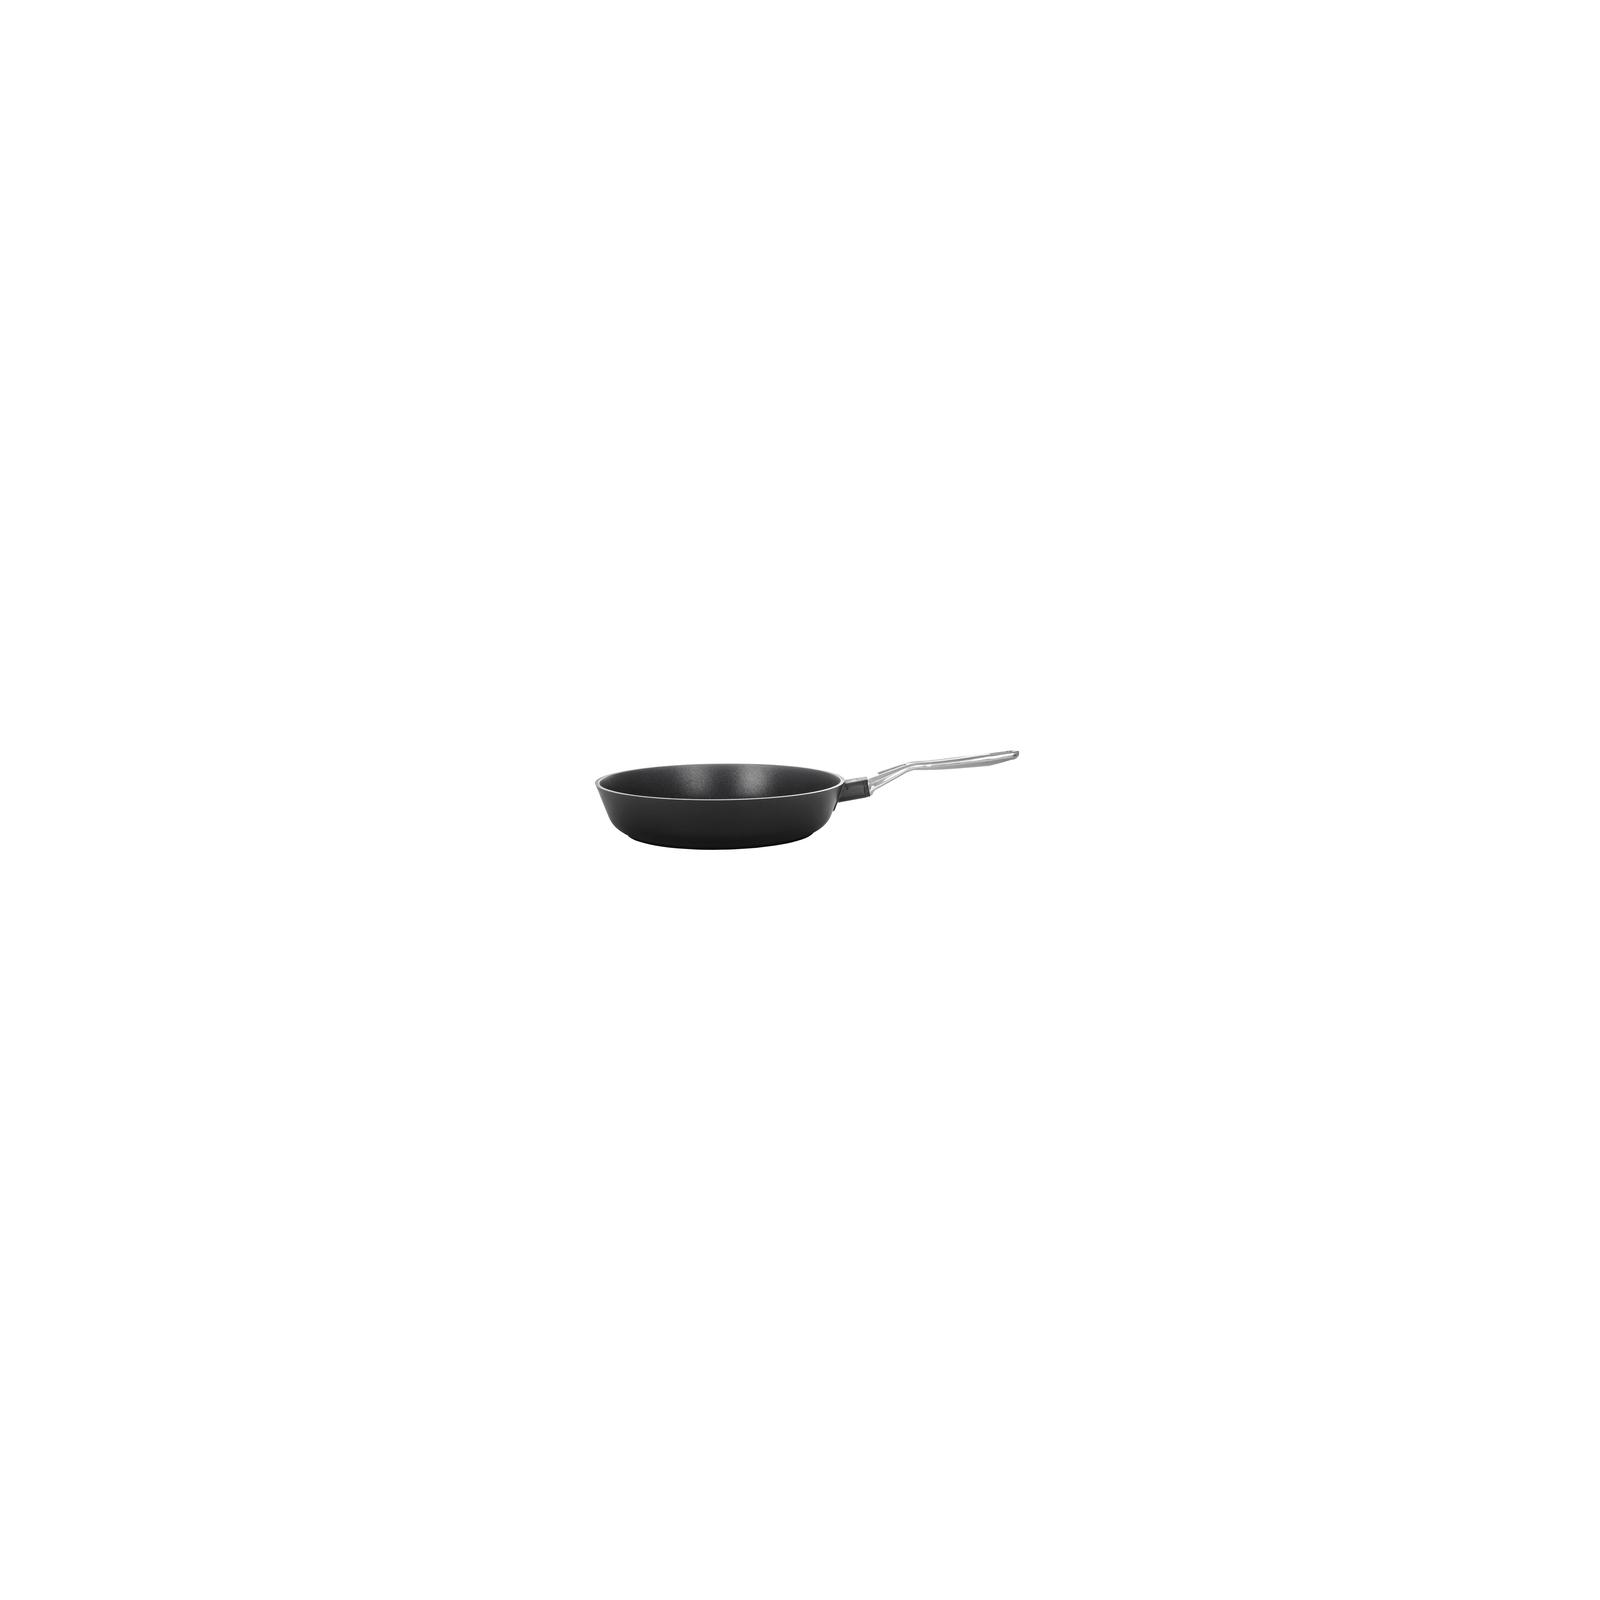 Сковорода Ringel IQ Be Chef 28 см (RG-1126-28) изображение 2